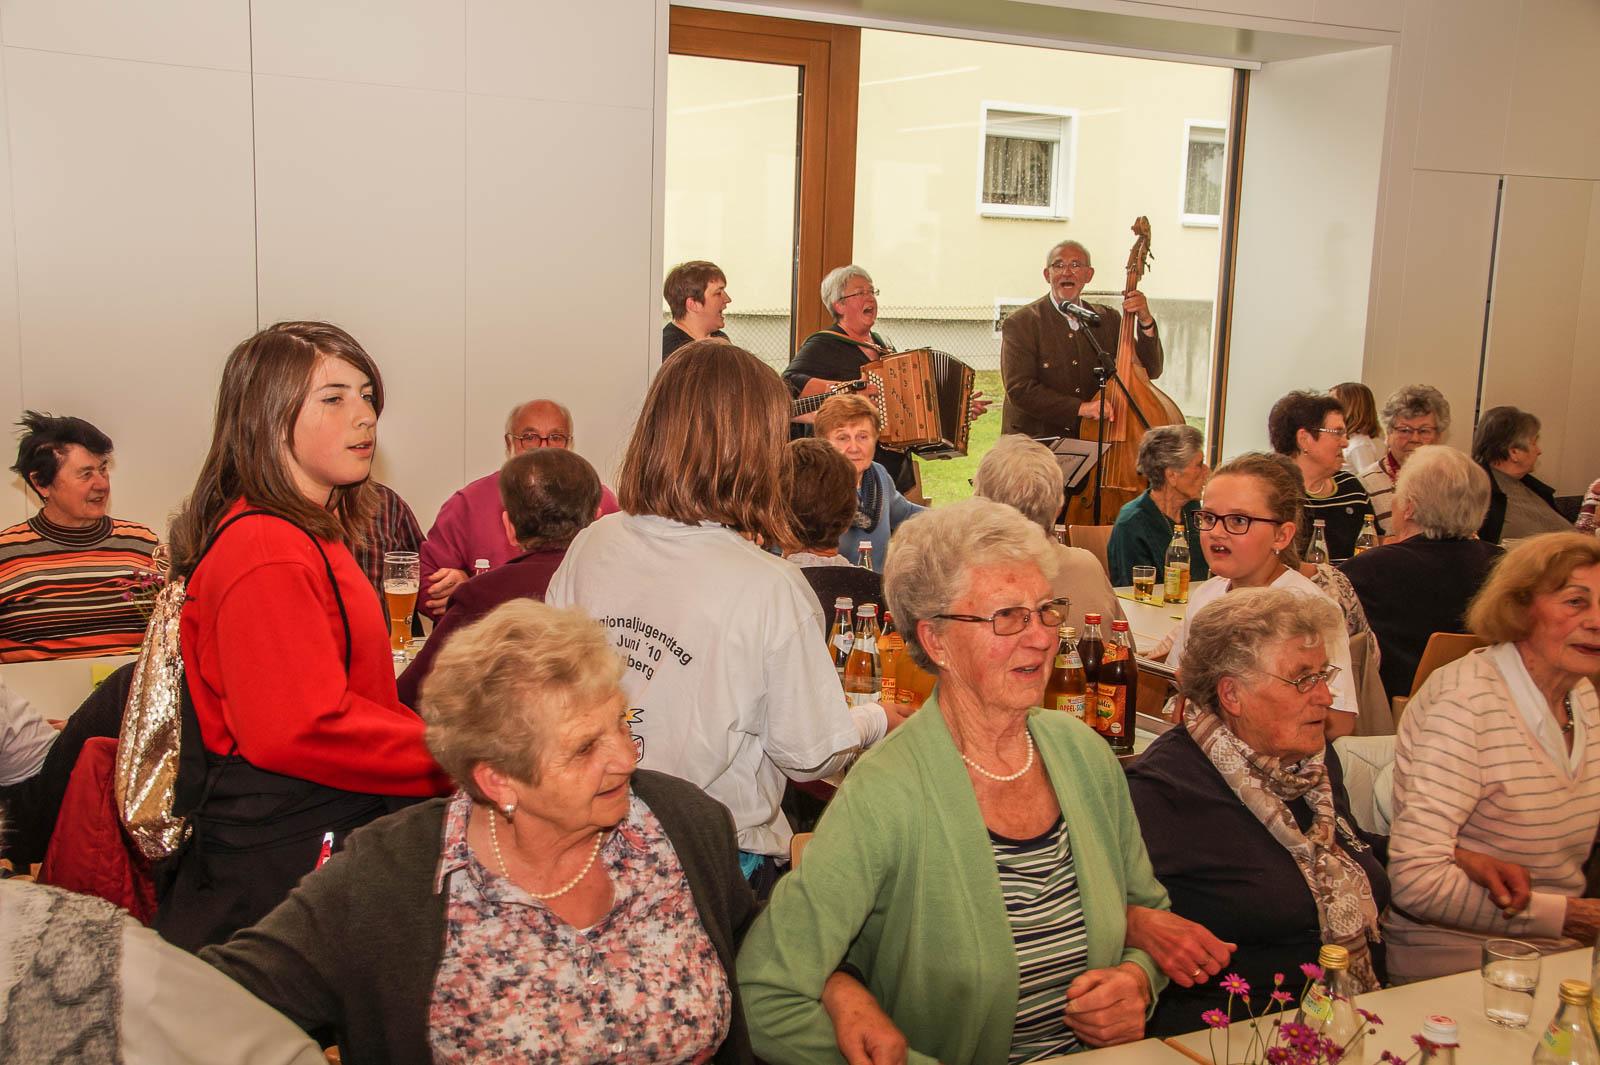 20190504-Seniorennachmittag Johanniter Pfarrheim SF_DSC04191